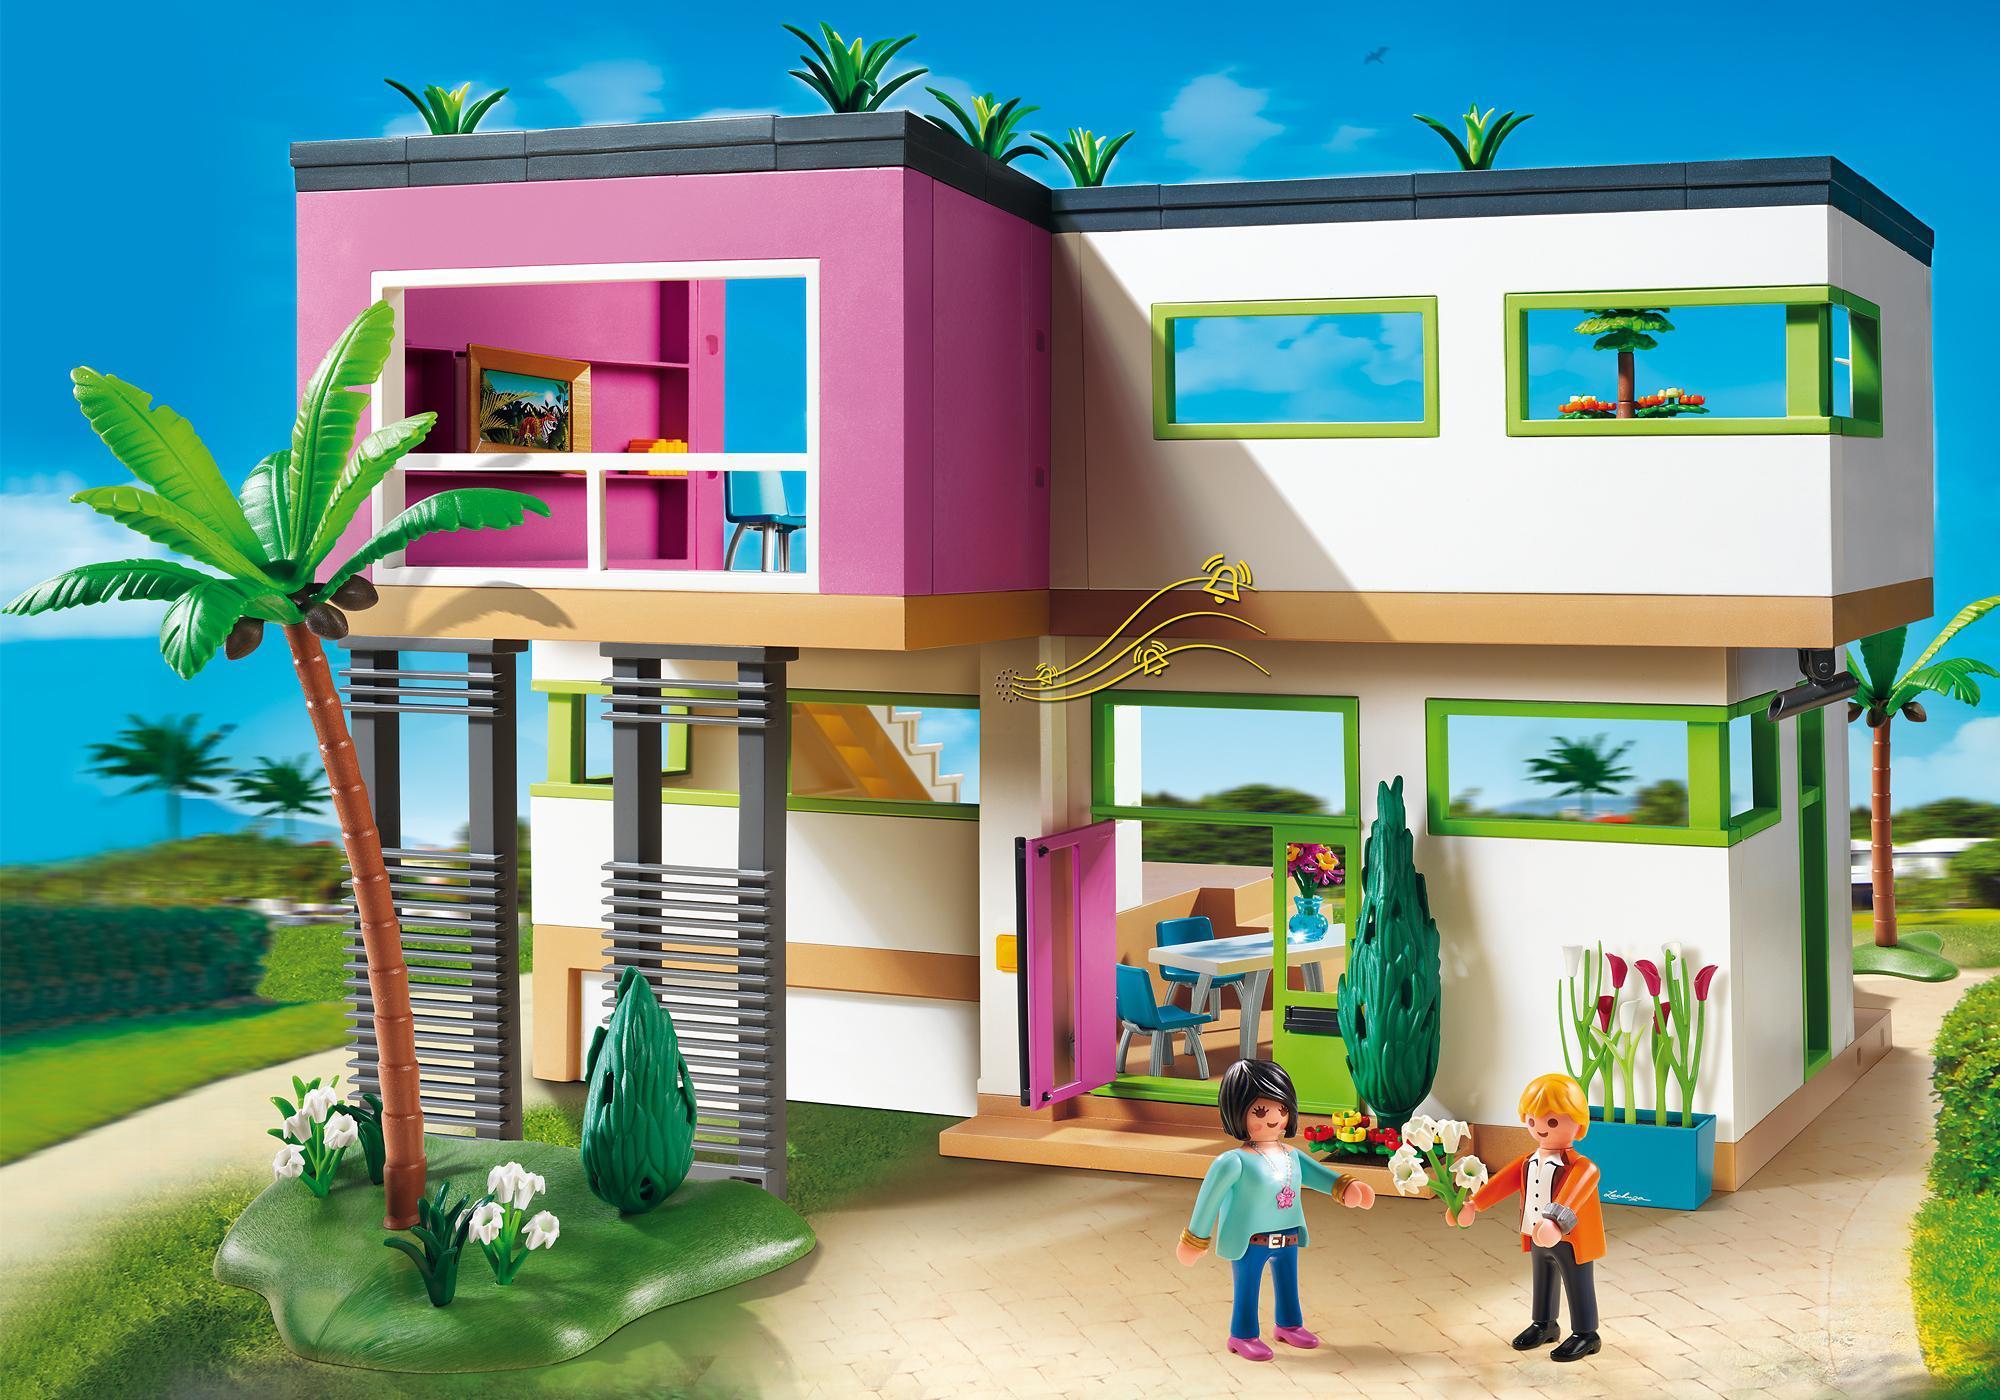 Beau Get Free High Quality HD Wallpapers Maison Moderne De Luxe Playmobil